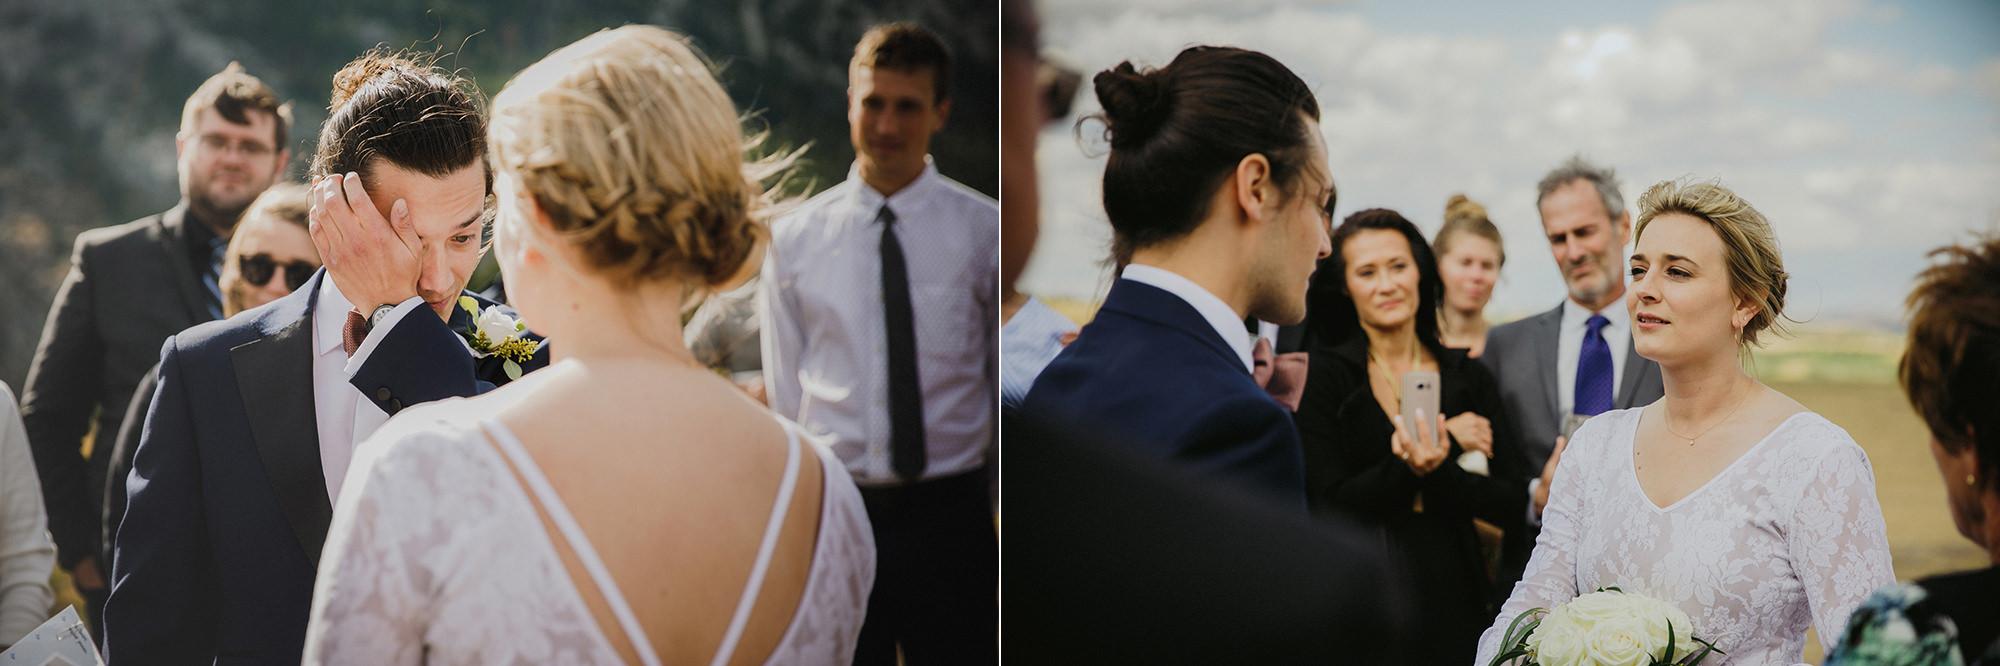 Waterton Wedding David Guenther -49.JPG